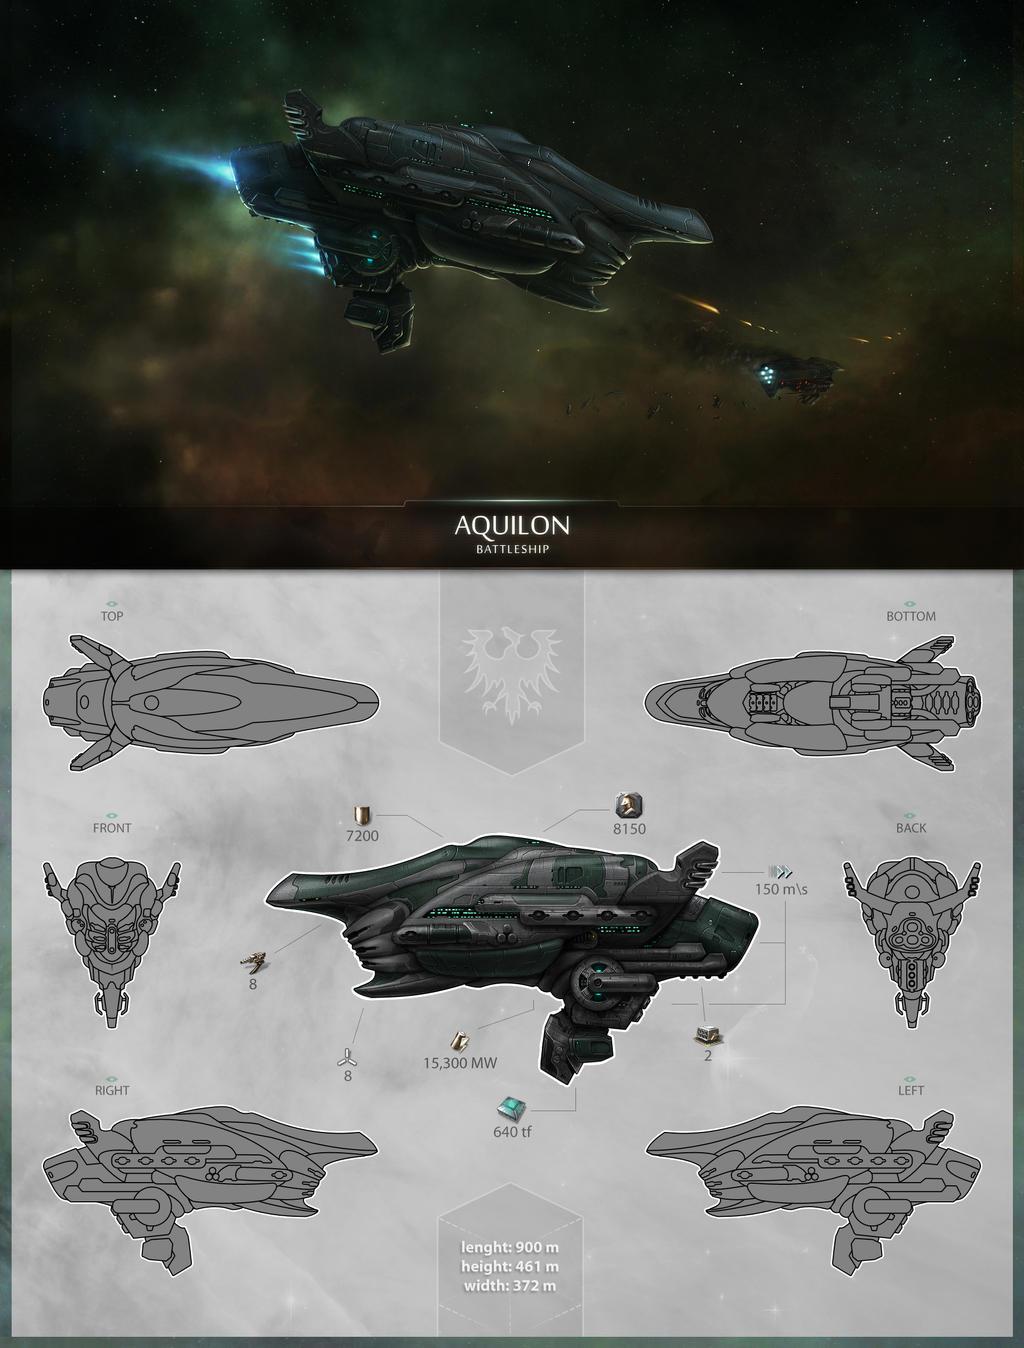 Aquilon by polarlex